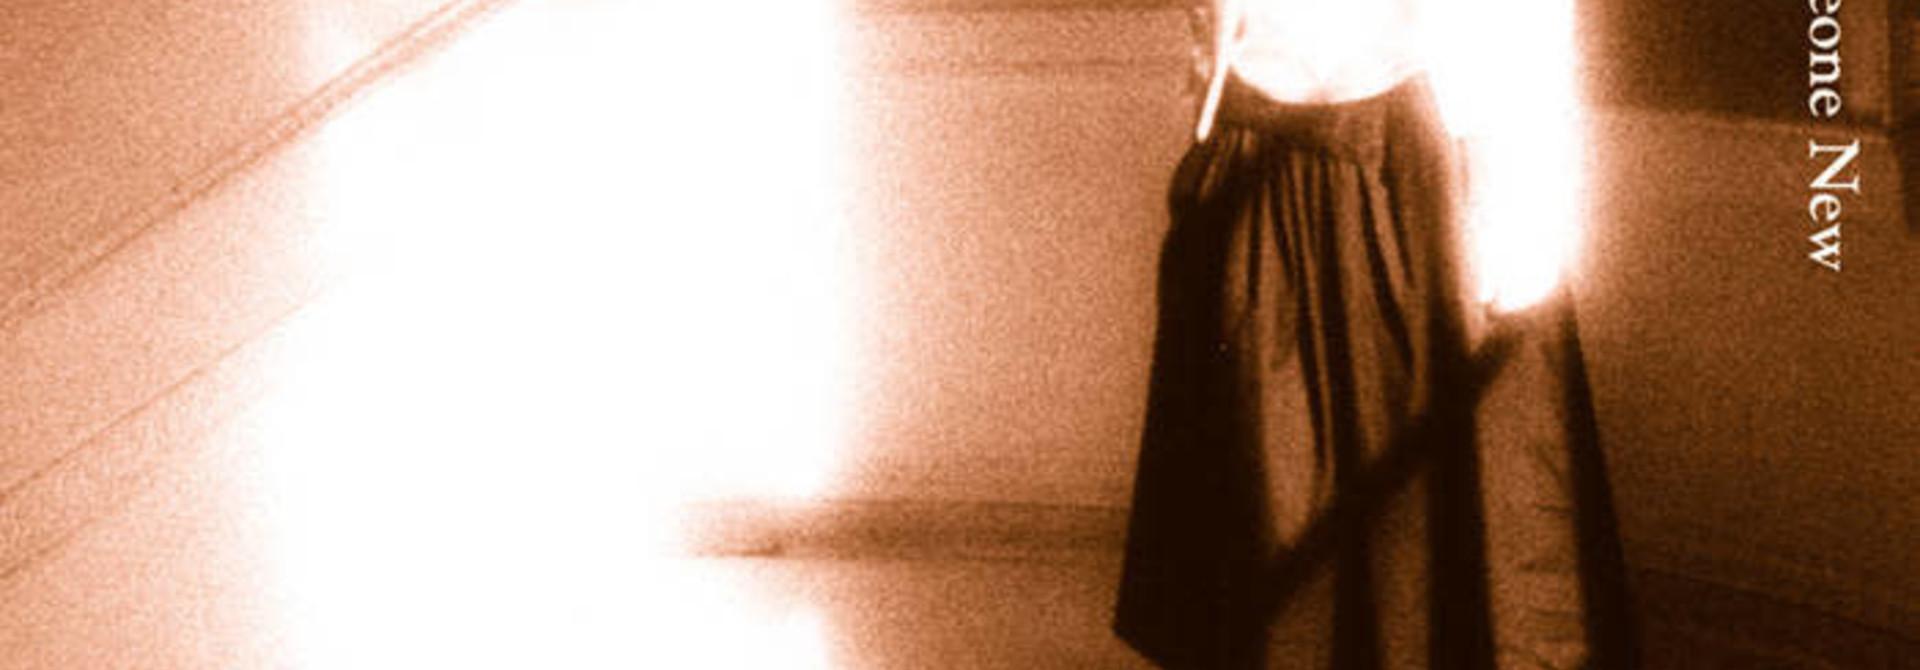 Arms Of Someone New • Susan Sleepwalking